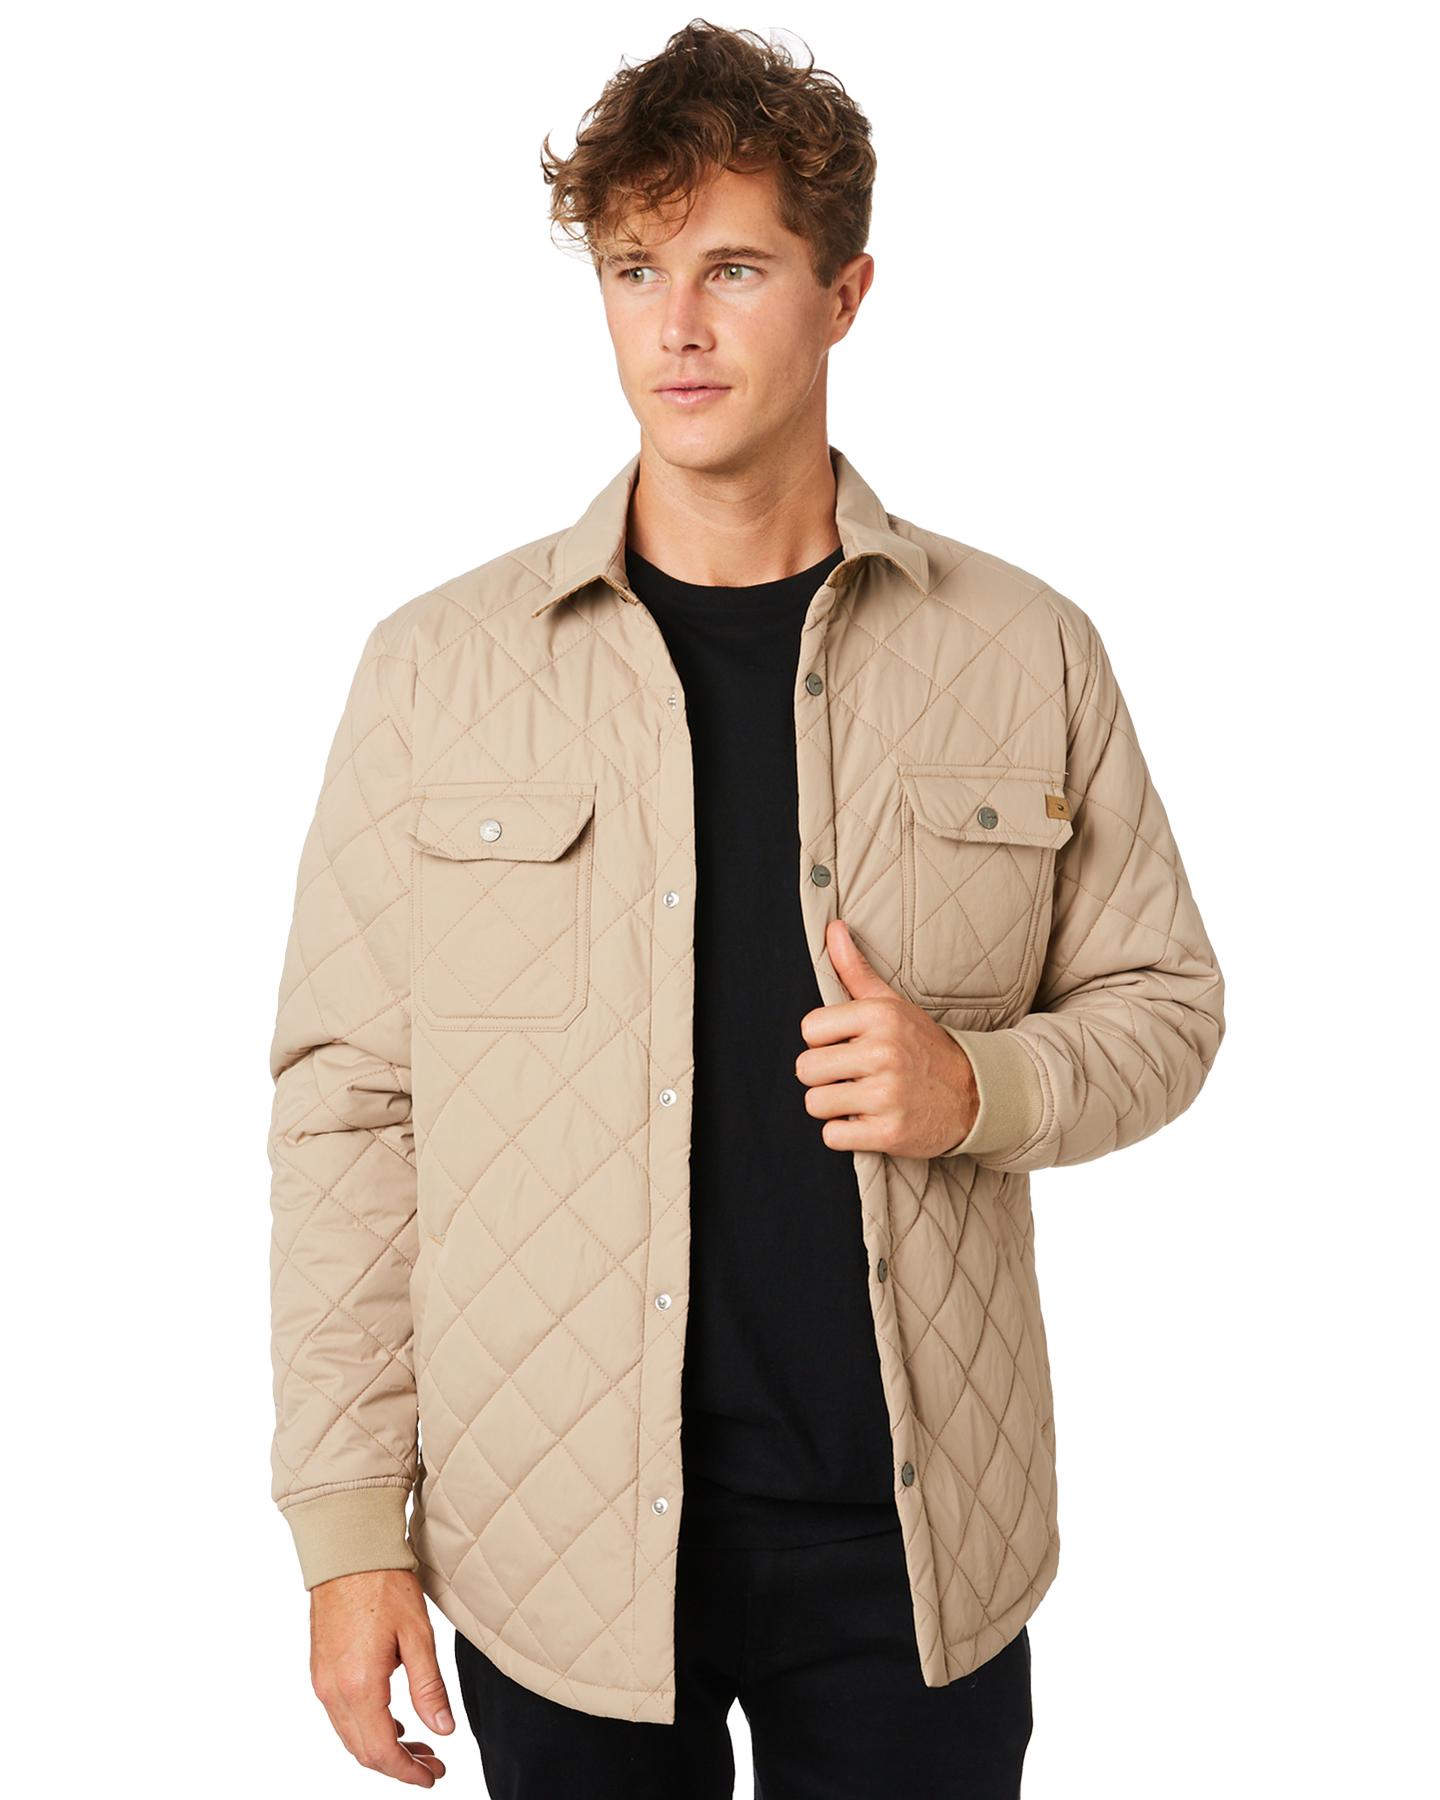 5a47873bd2 Details about New Rip Curl Men's Dover Anti Series Mens Jacket Khaki